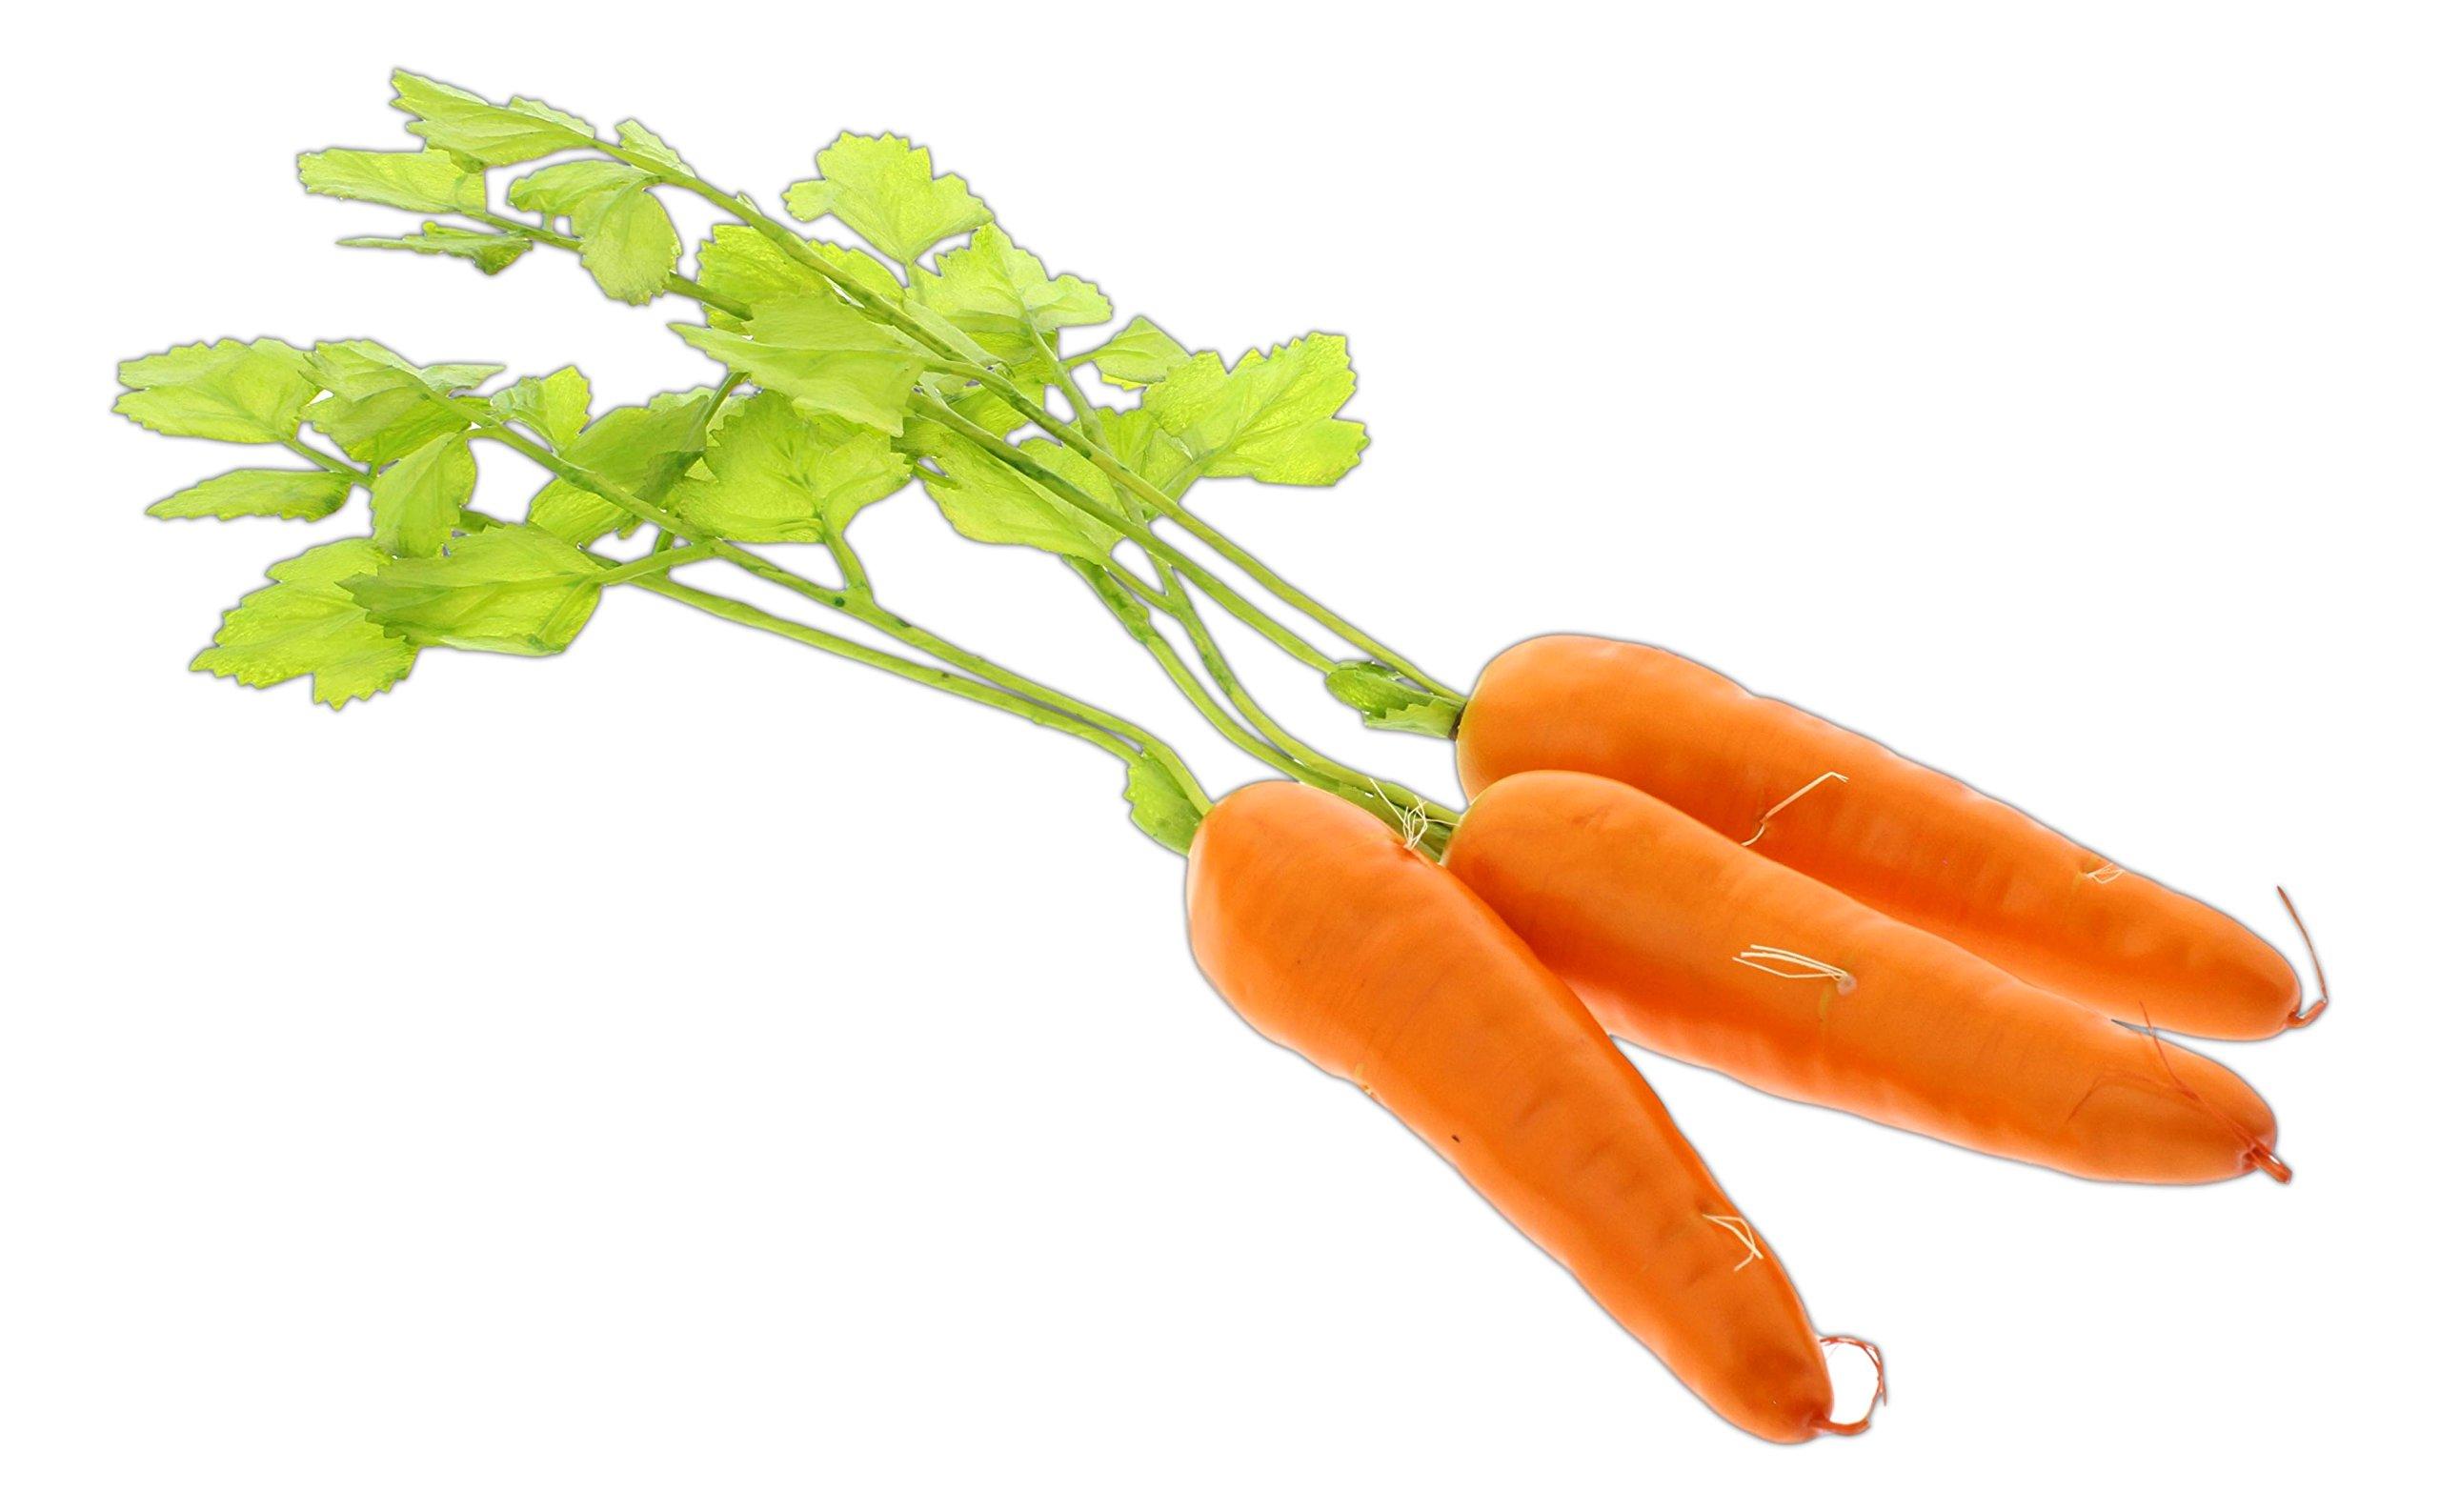 Flora Bunda 15'' Artificial Raw Carrot Replica Props - Set of 3